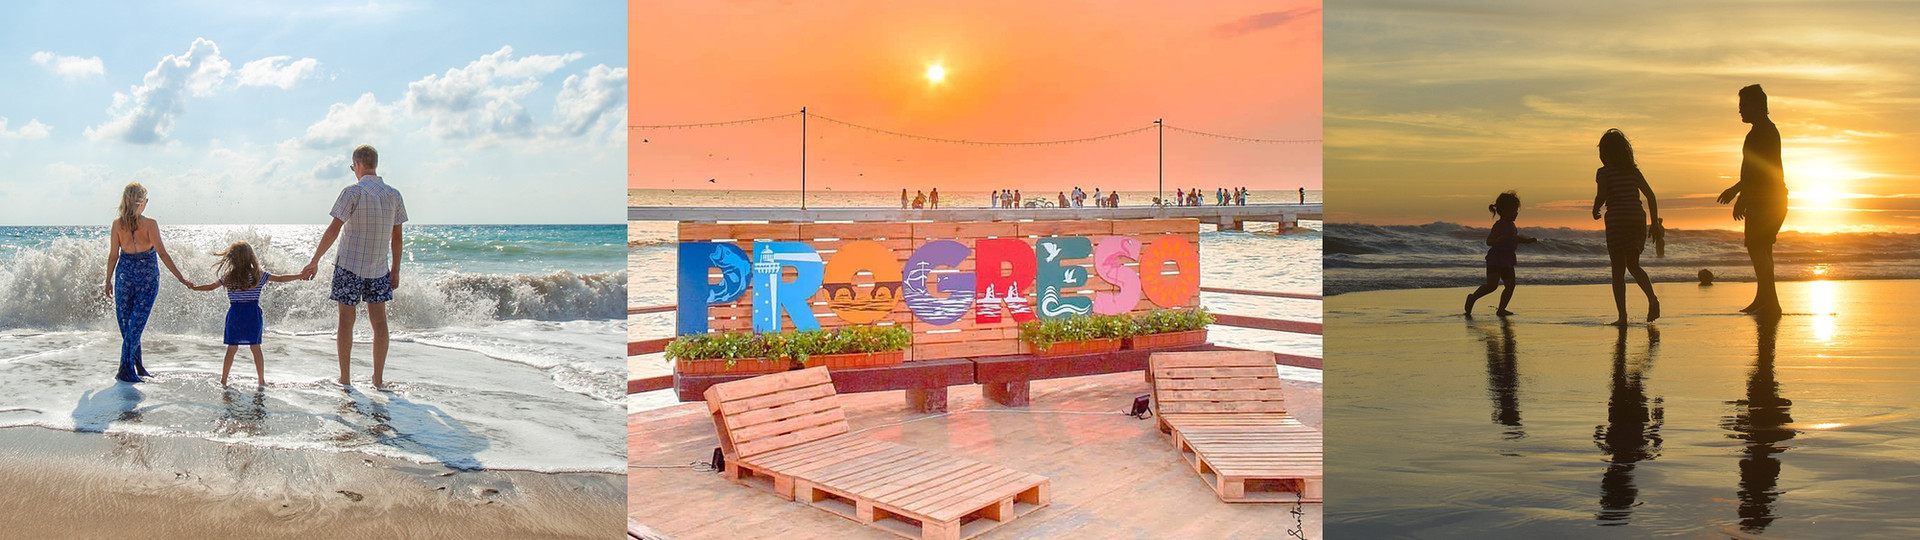 best-family-vacation-places-visit-beach-ocean-merida-yucatan-mexico